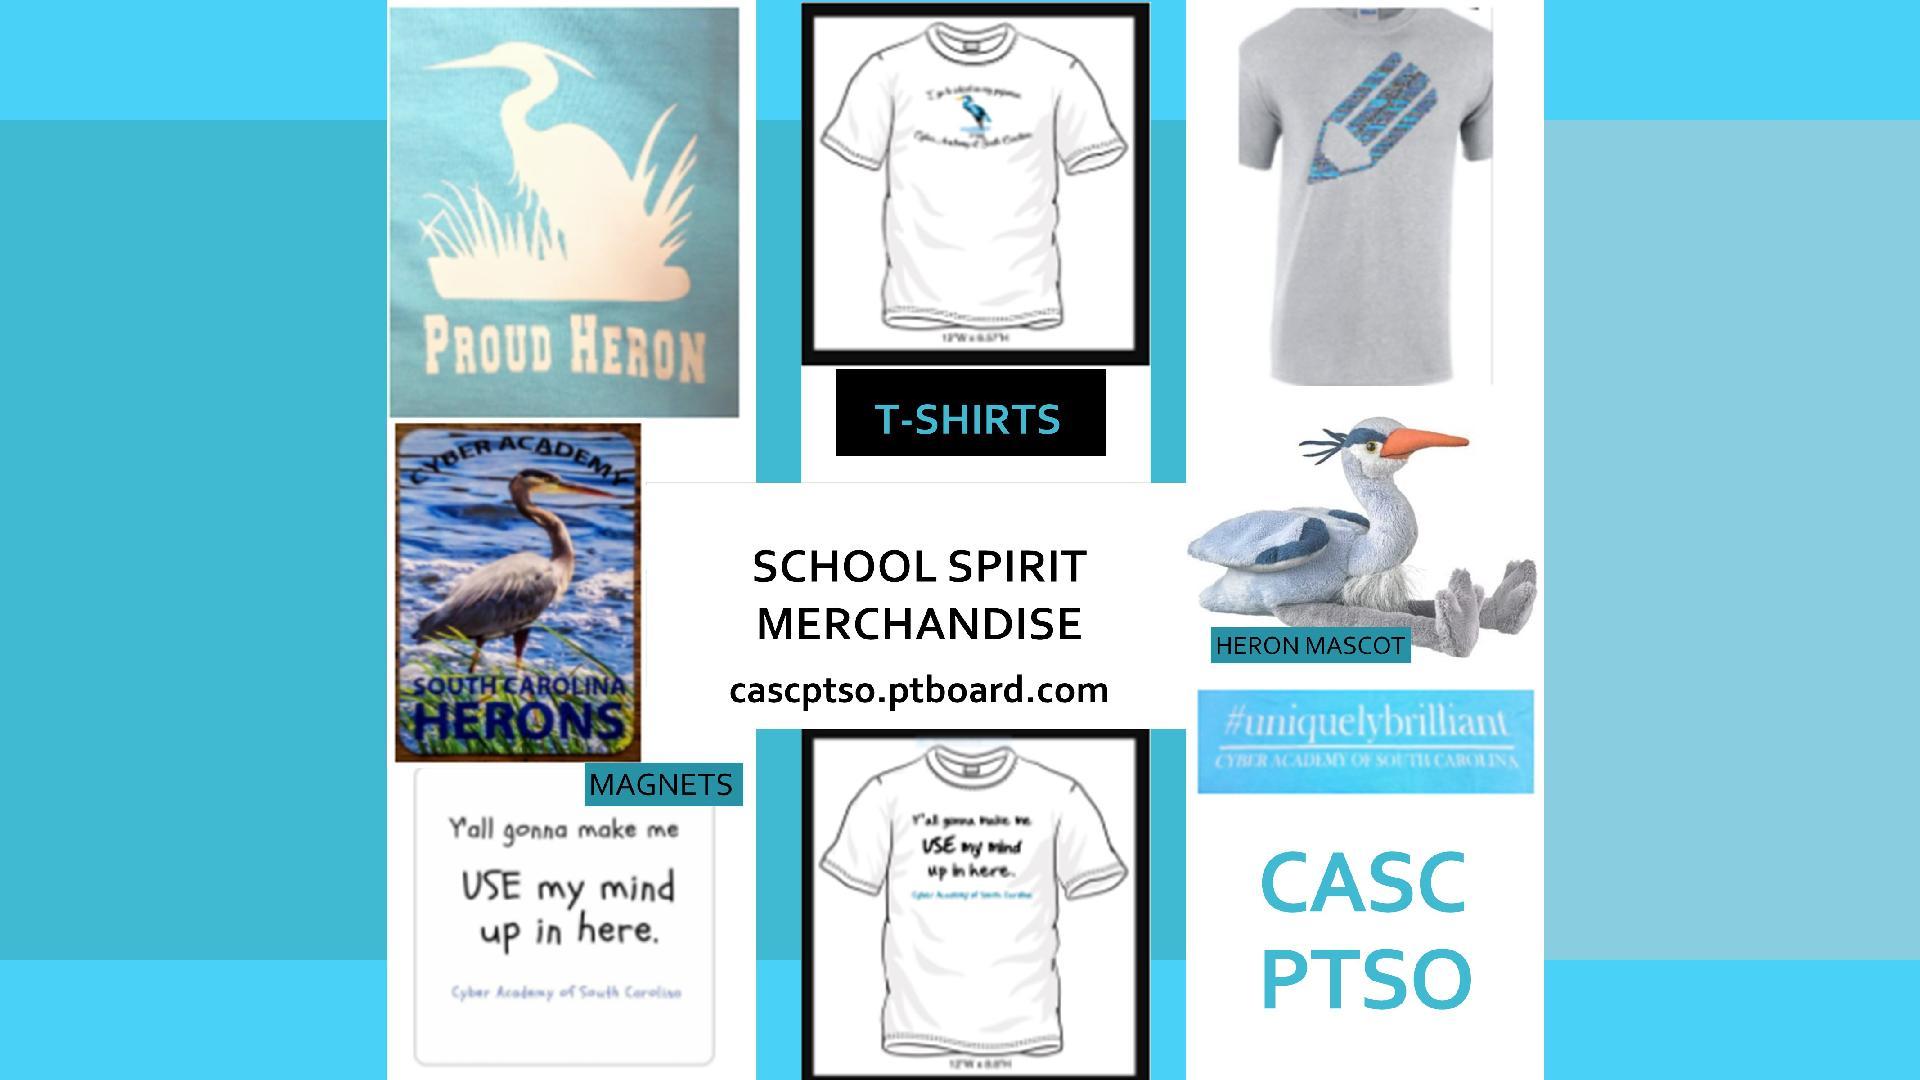 Cyber Academy of South Carolina PTSO